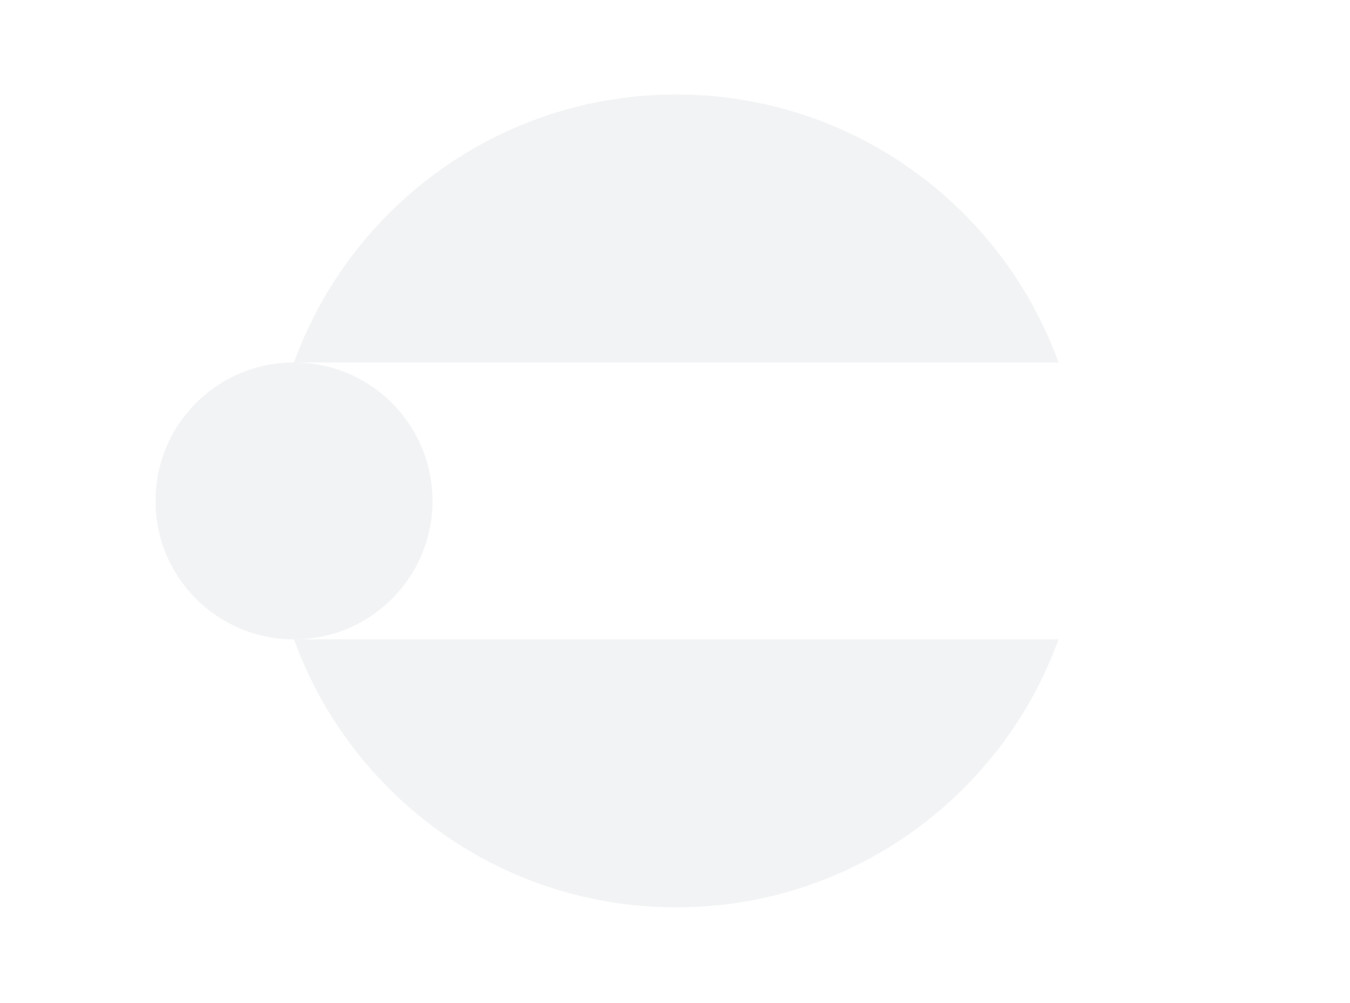 Logoi Clock Divider / Counter / Delay